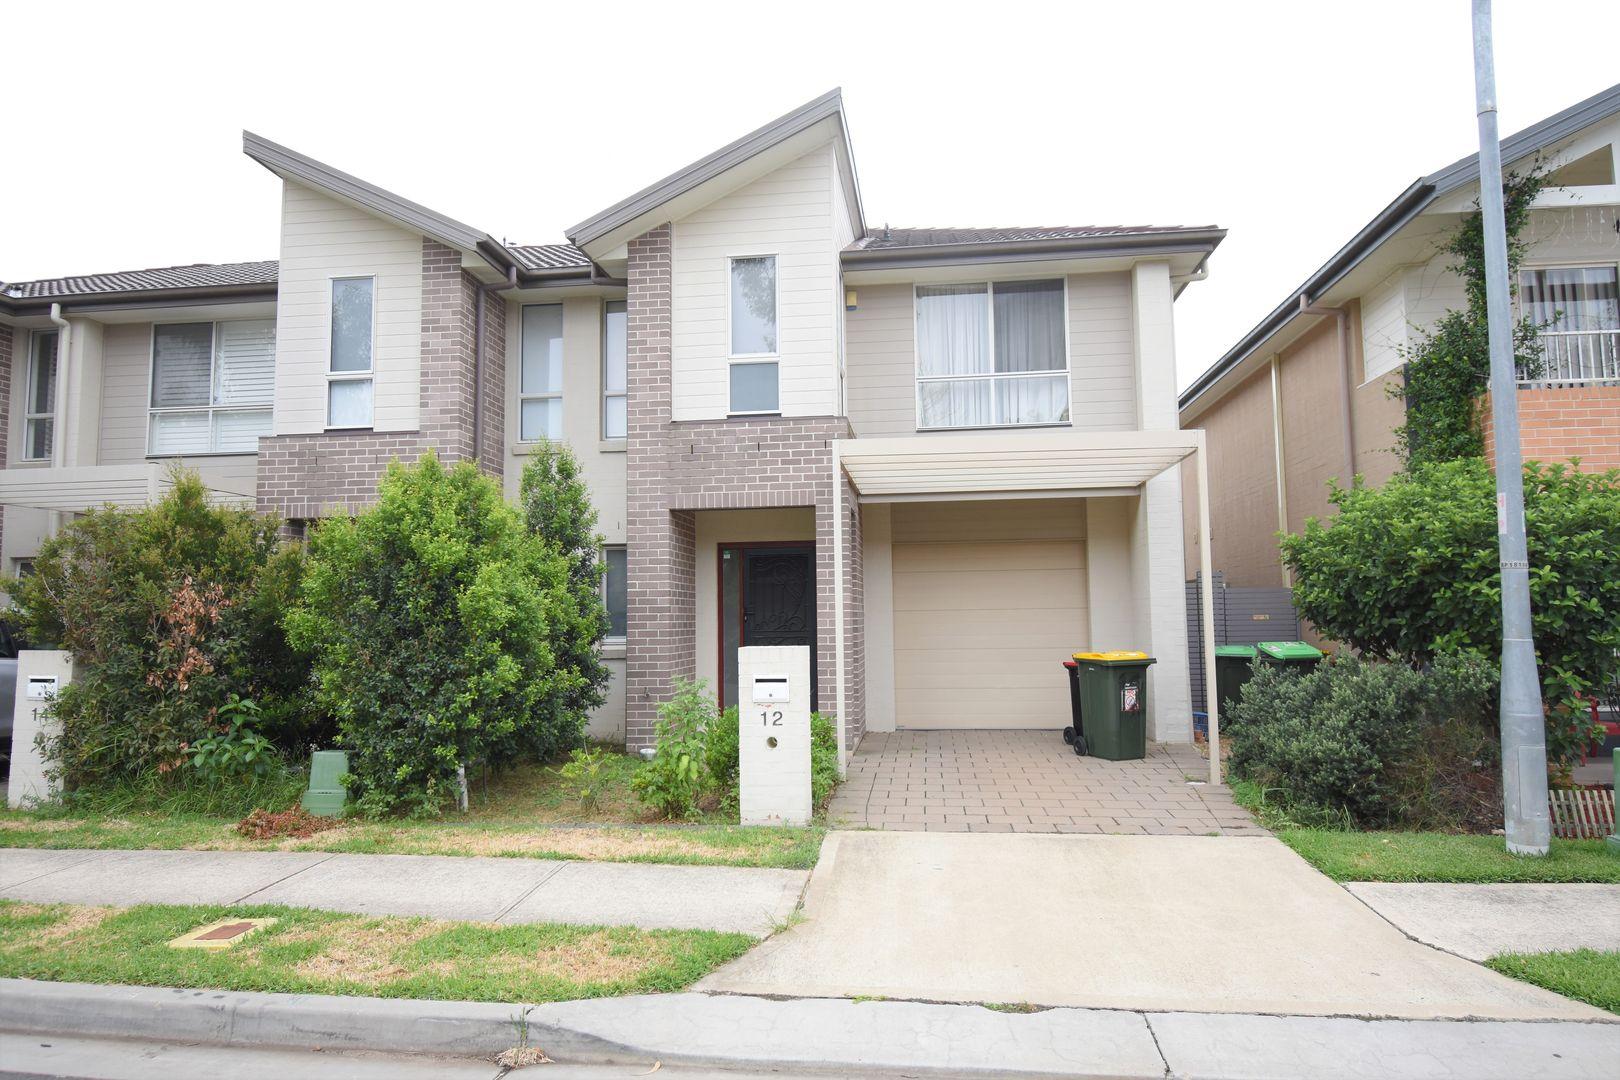 12 Baret Street, Lidcombe NSW 2141, Image 0